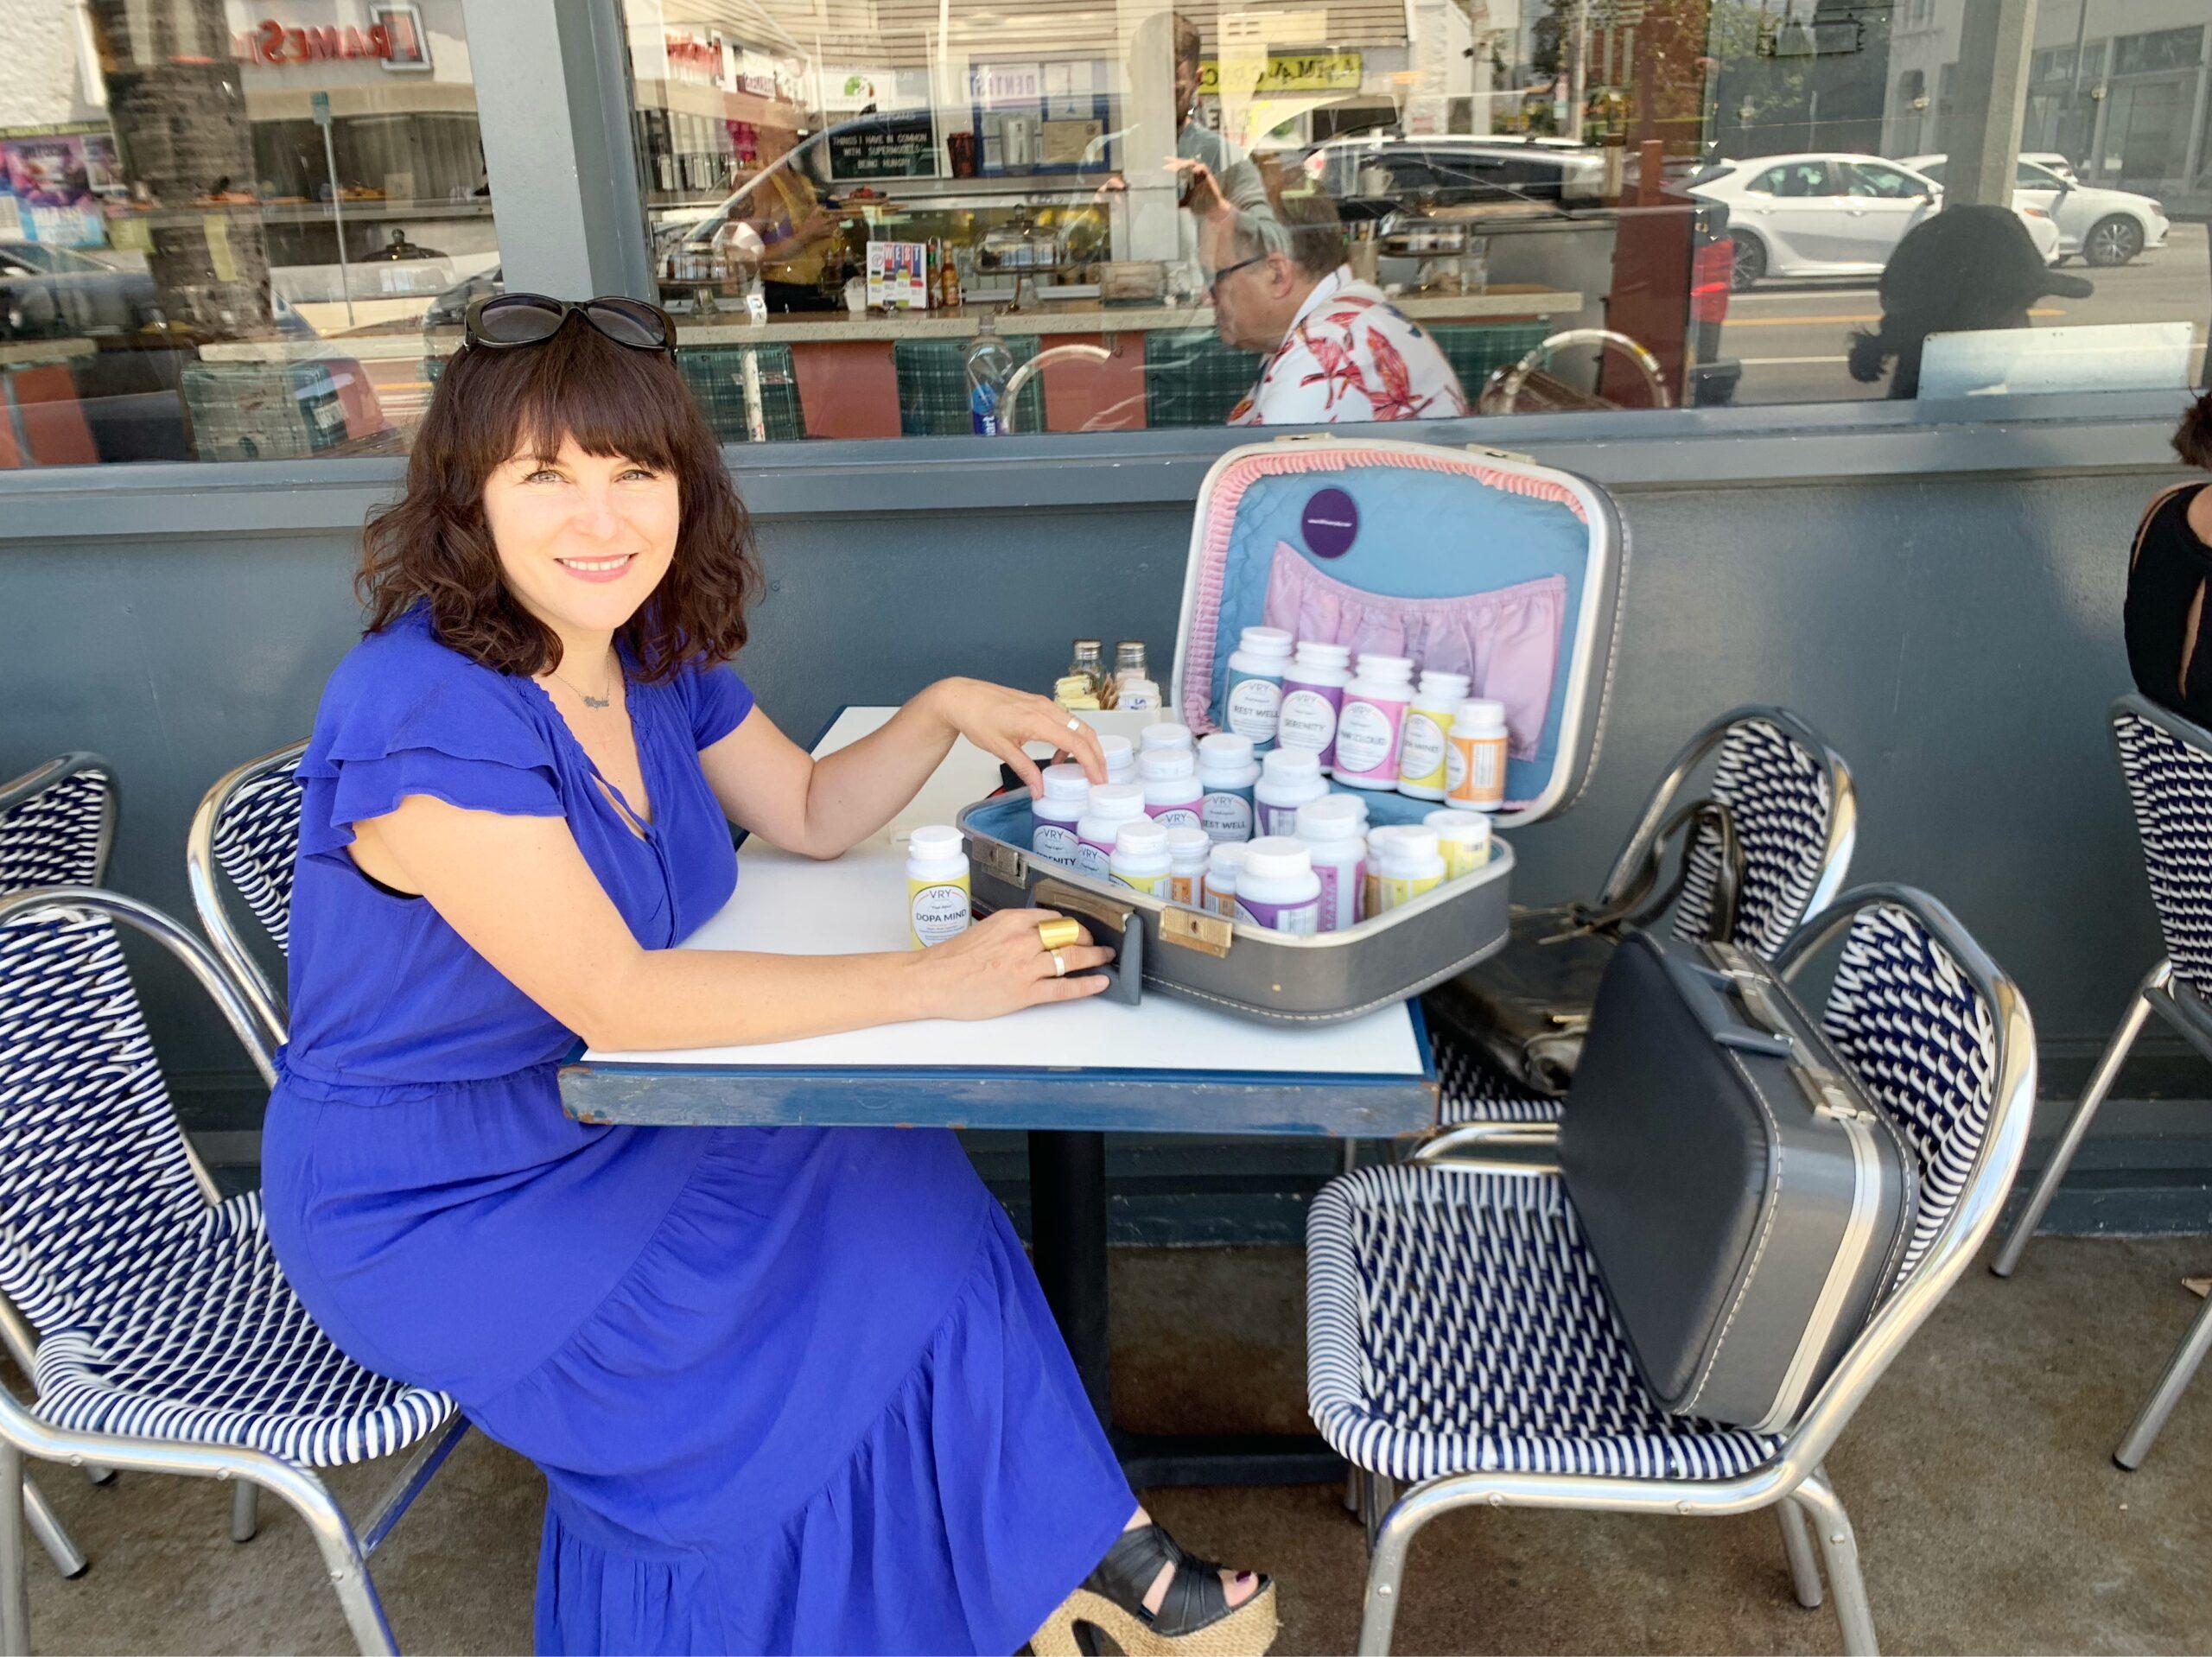 Voyage LA: LA's Most Inspiring Stories with Rynda Laurel